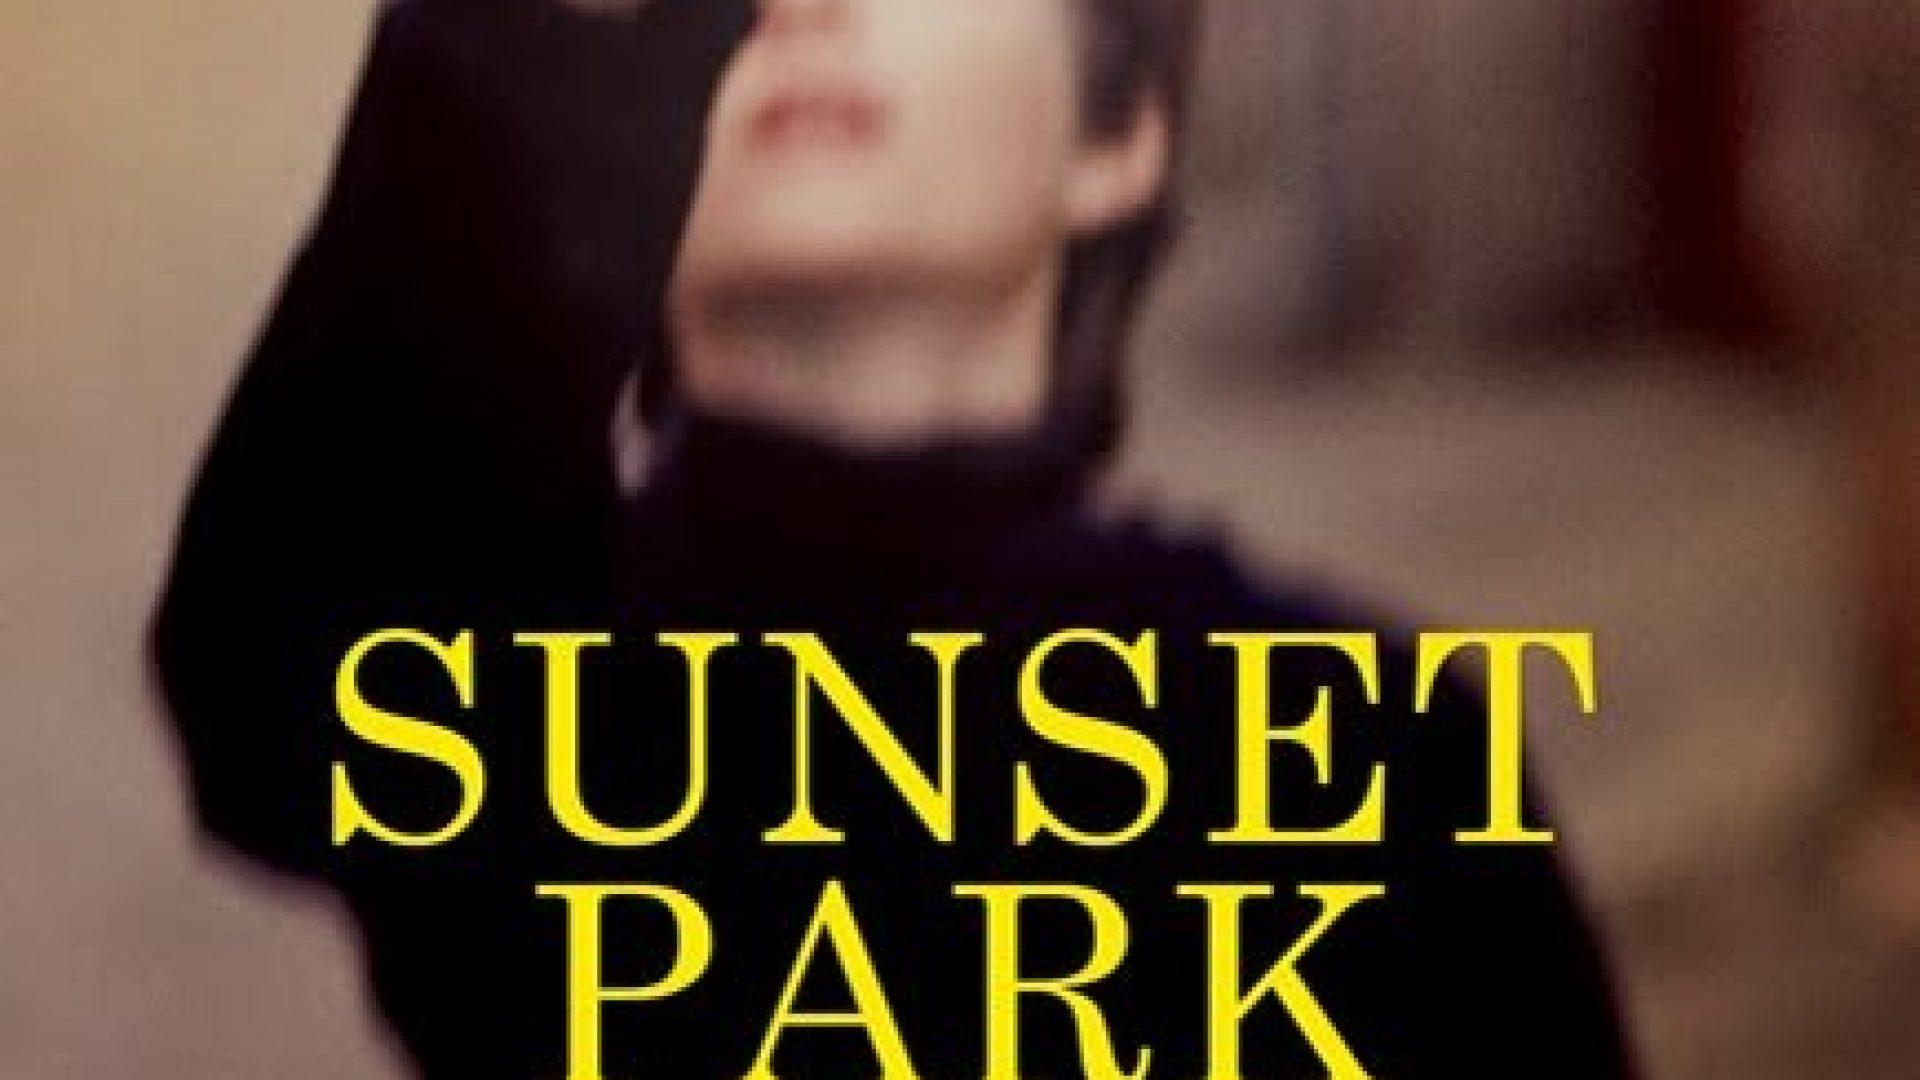 Capa de Sunset Park, de Paul Auster